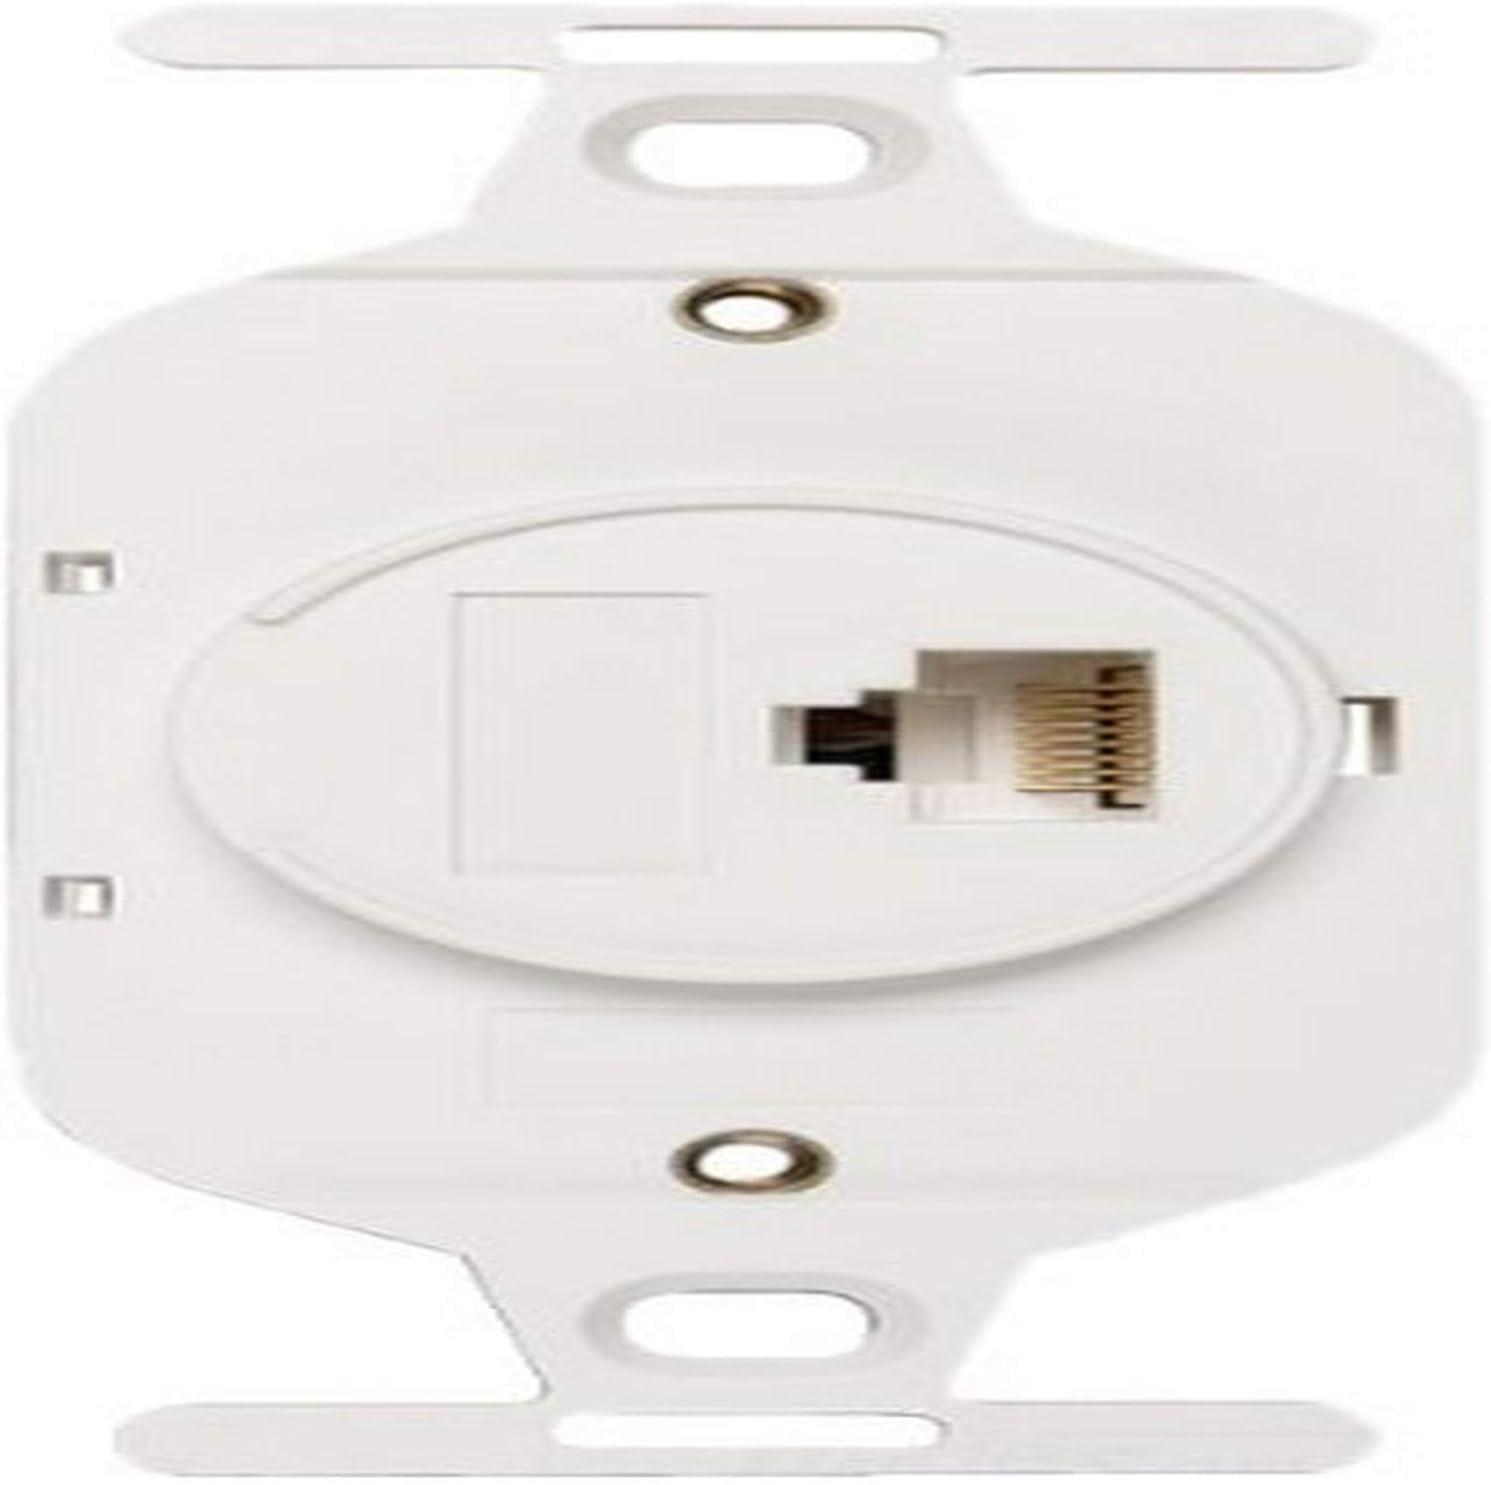 White Allen Tel Products AT105AF-15 USOC Wiring 1 Port 8 Conductor 8 Position Flush Mount IDC Outlet Jack